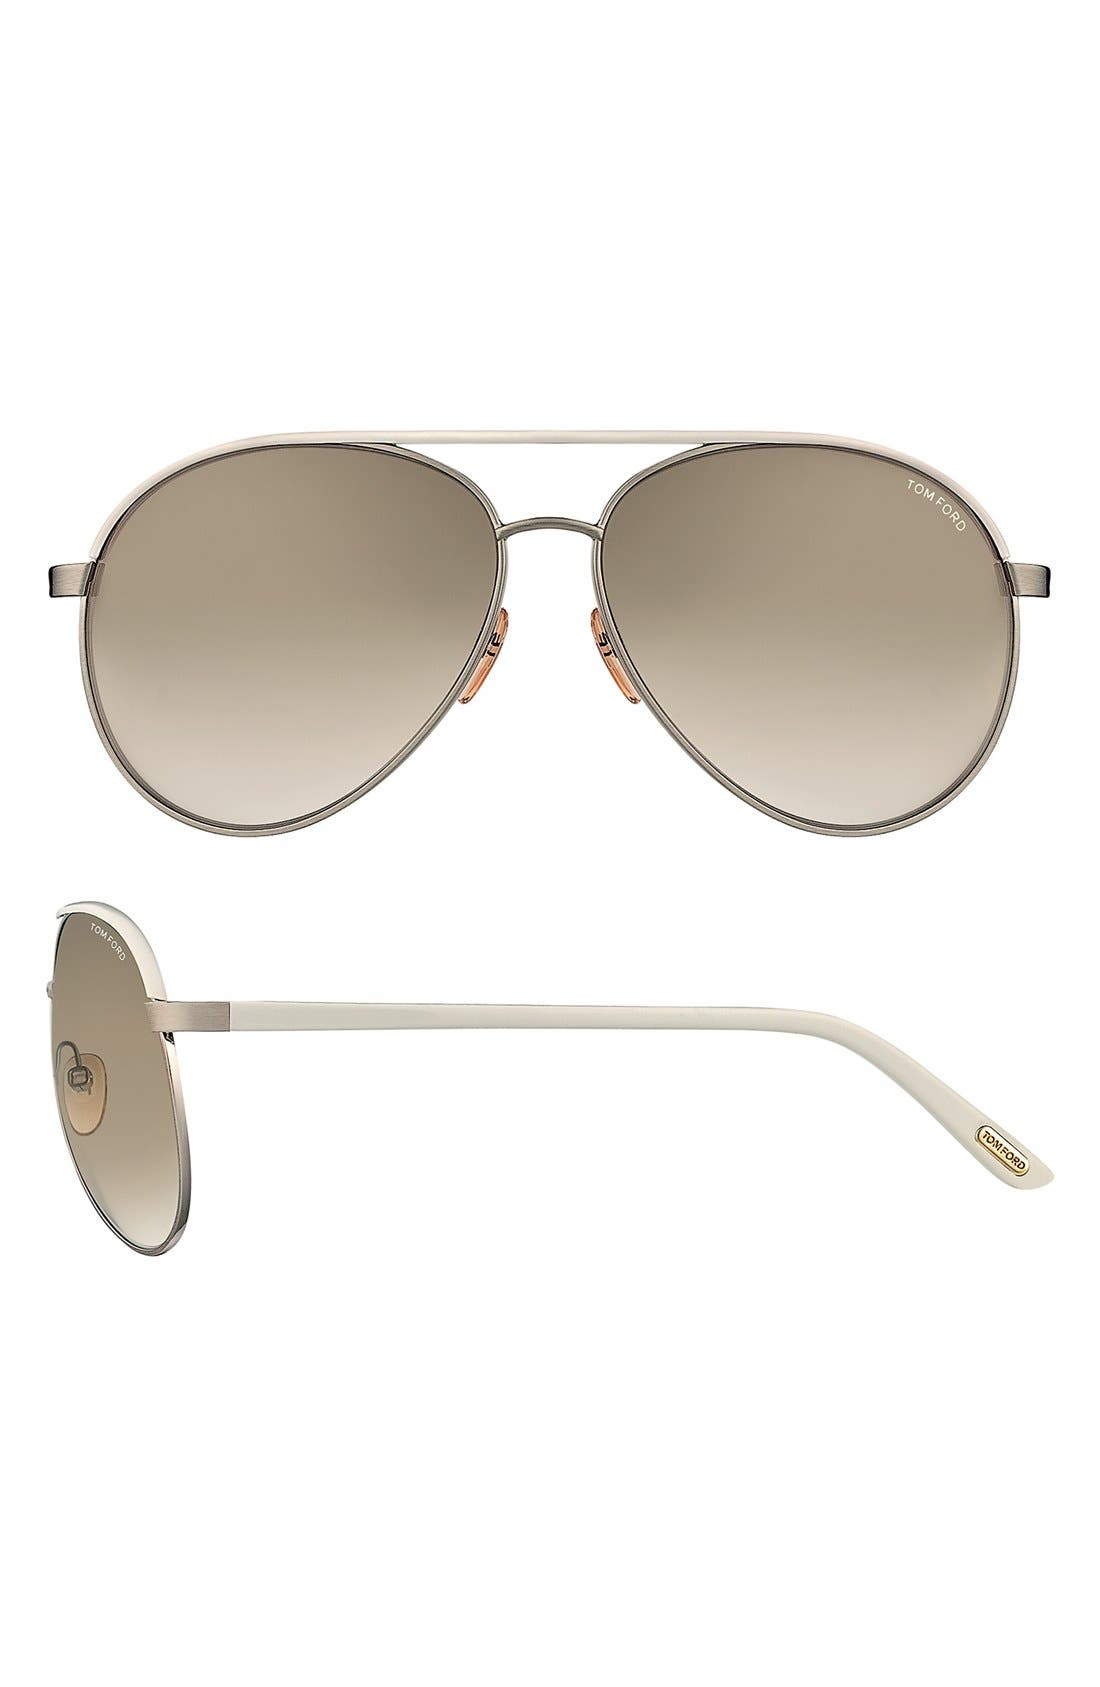 Alternate Image 1 Selected - Tom Ford 'Silvano' 59mm Polarized Sunglasses